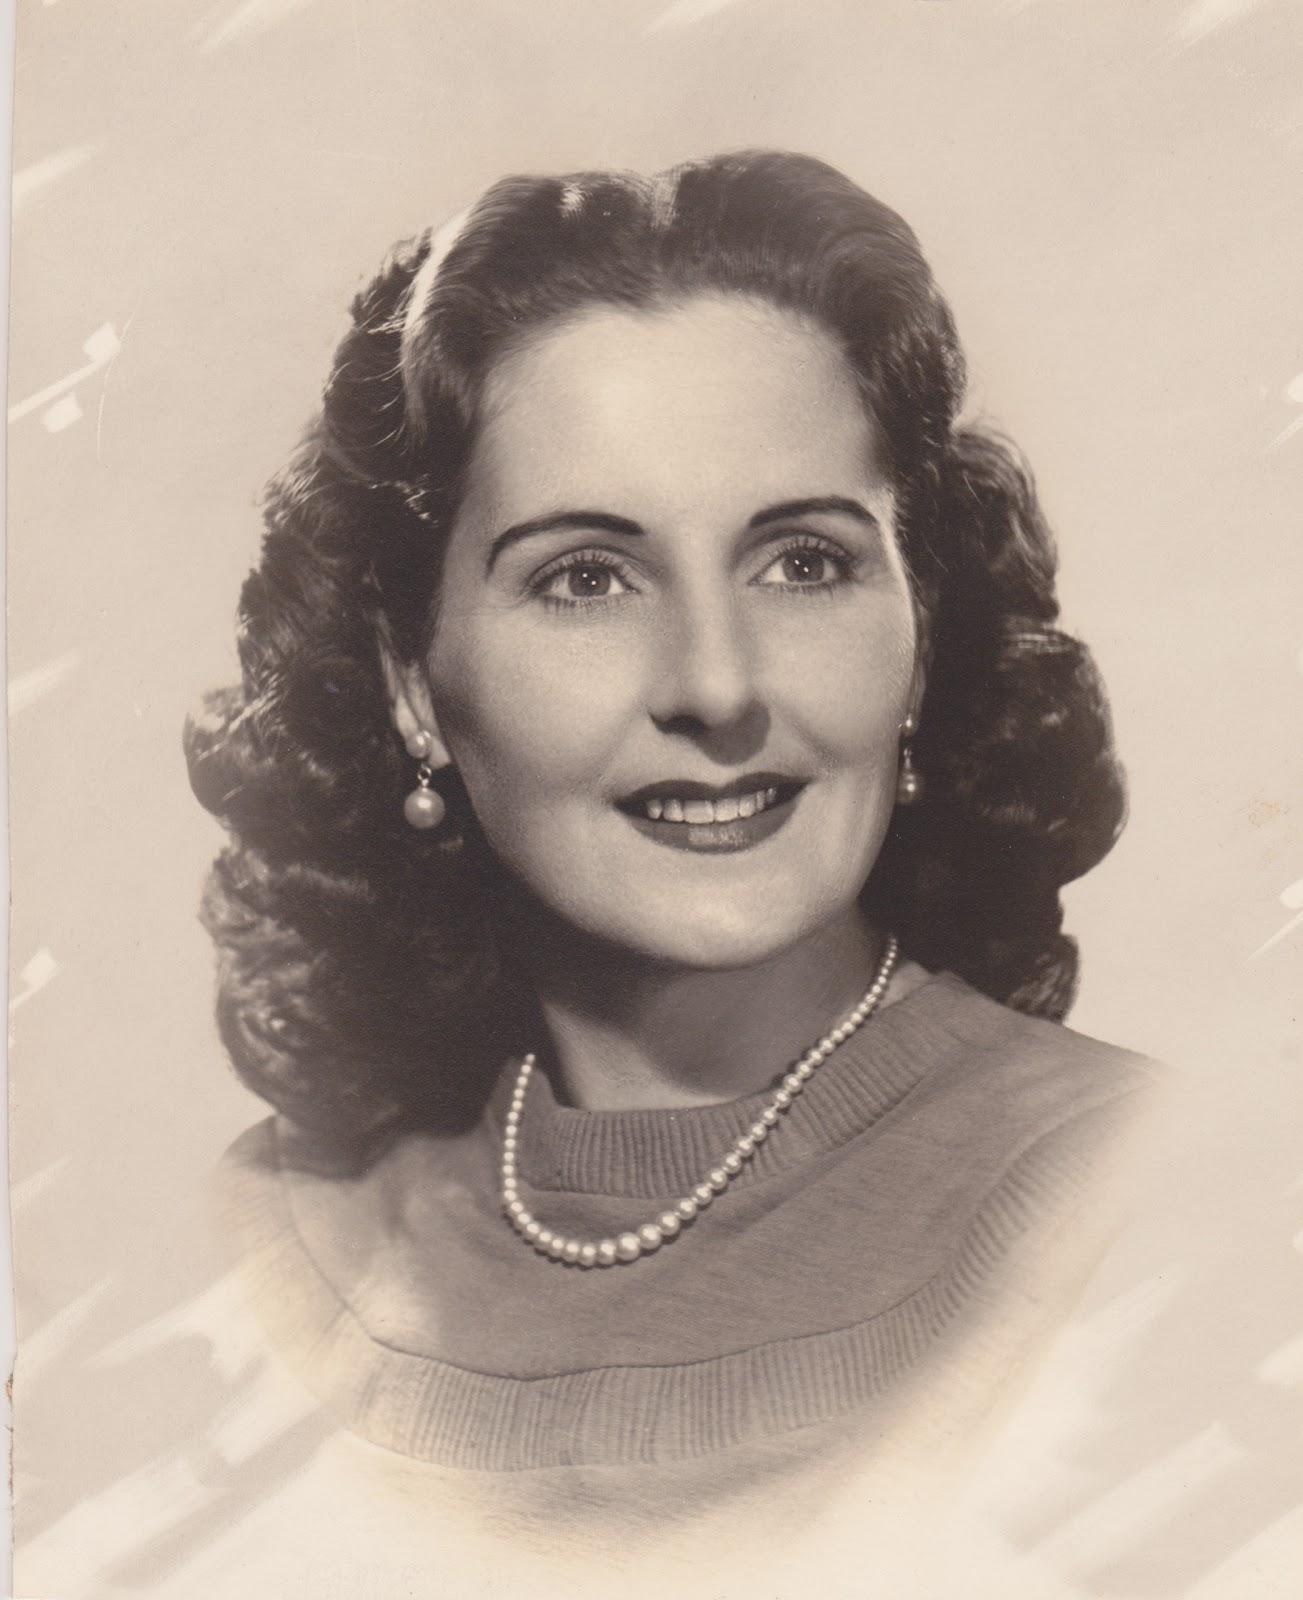 Camille Saviola Adult pic Renie Riano,Susie Essman born May 31, 1955 (age 63)